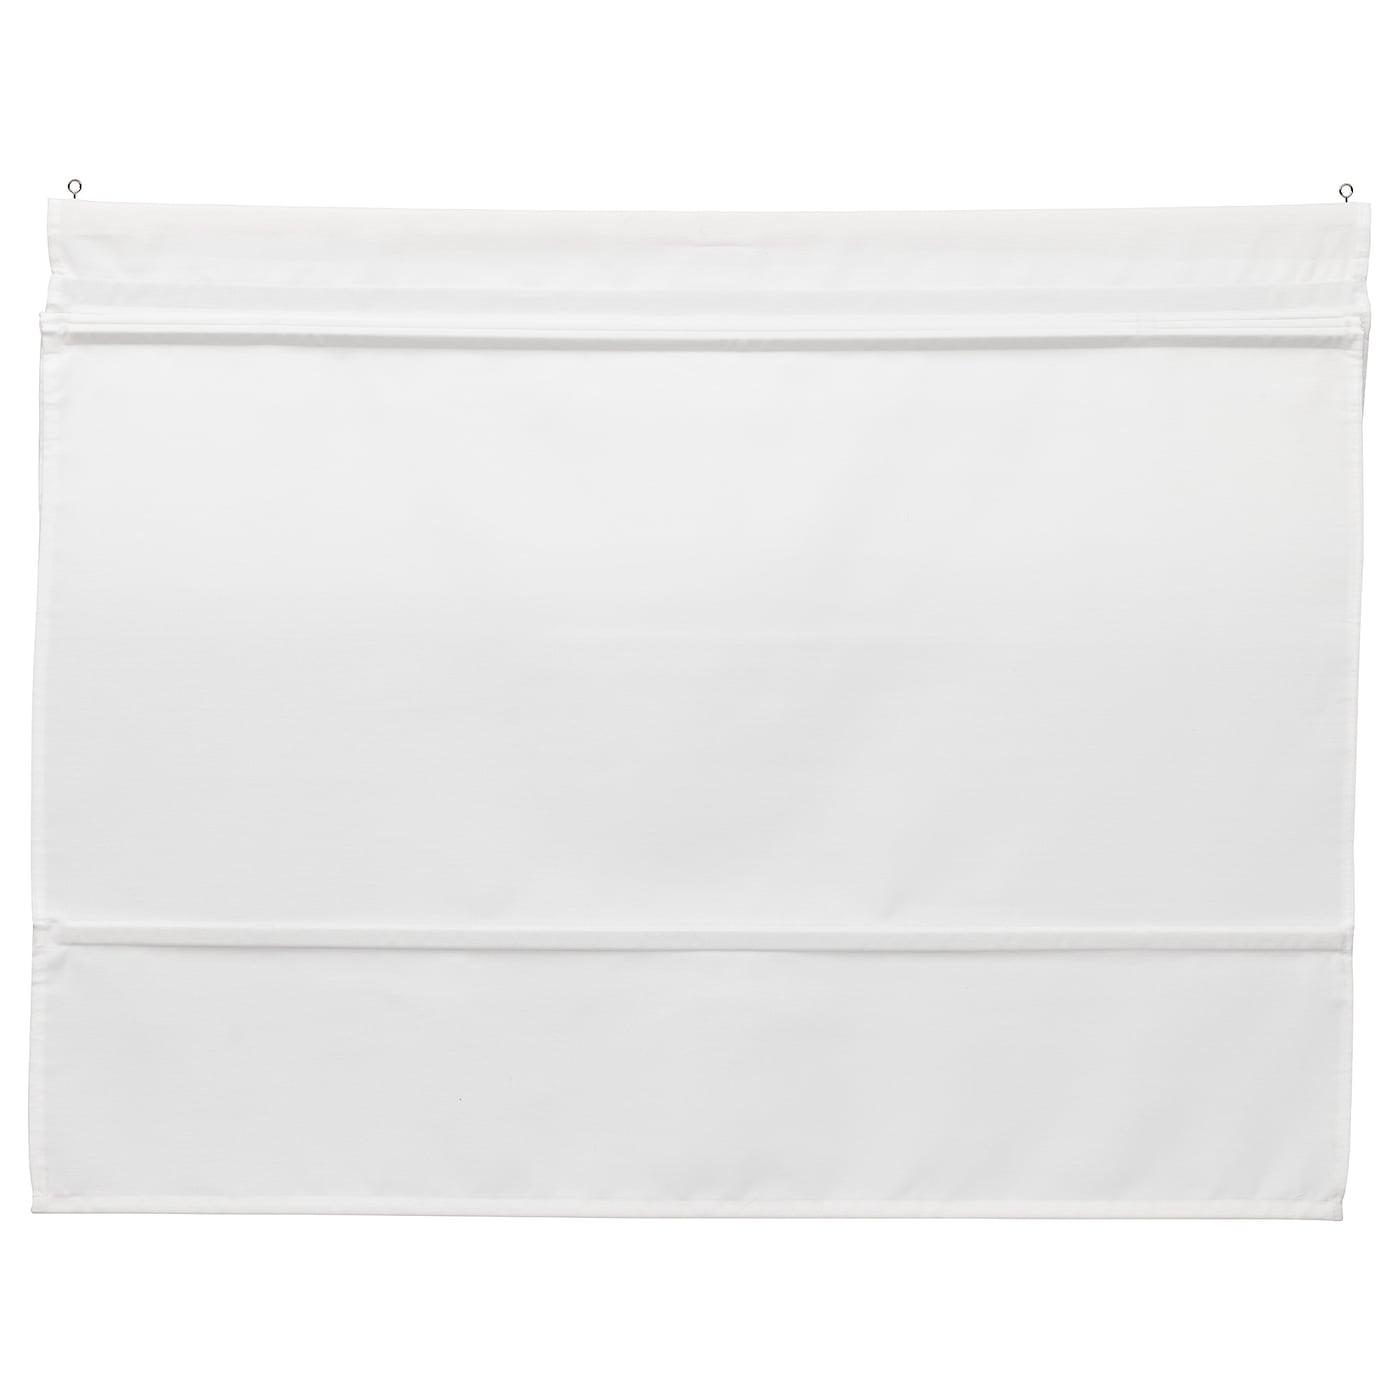 Store Bateau Blanc Ikea ringblomma store bateau - blanc 100x160 cm